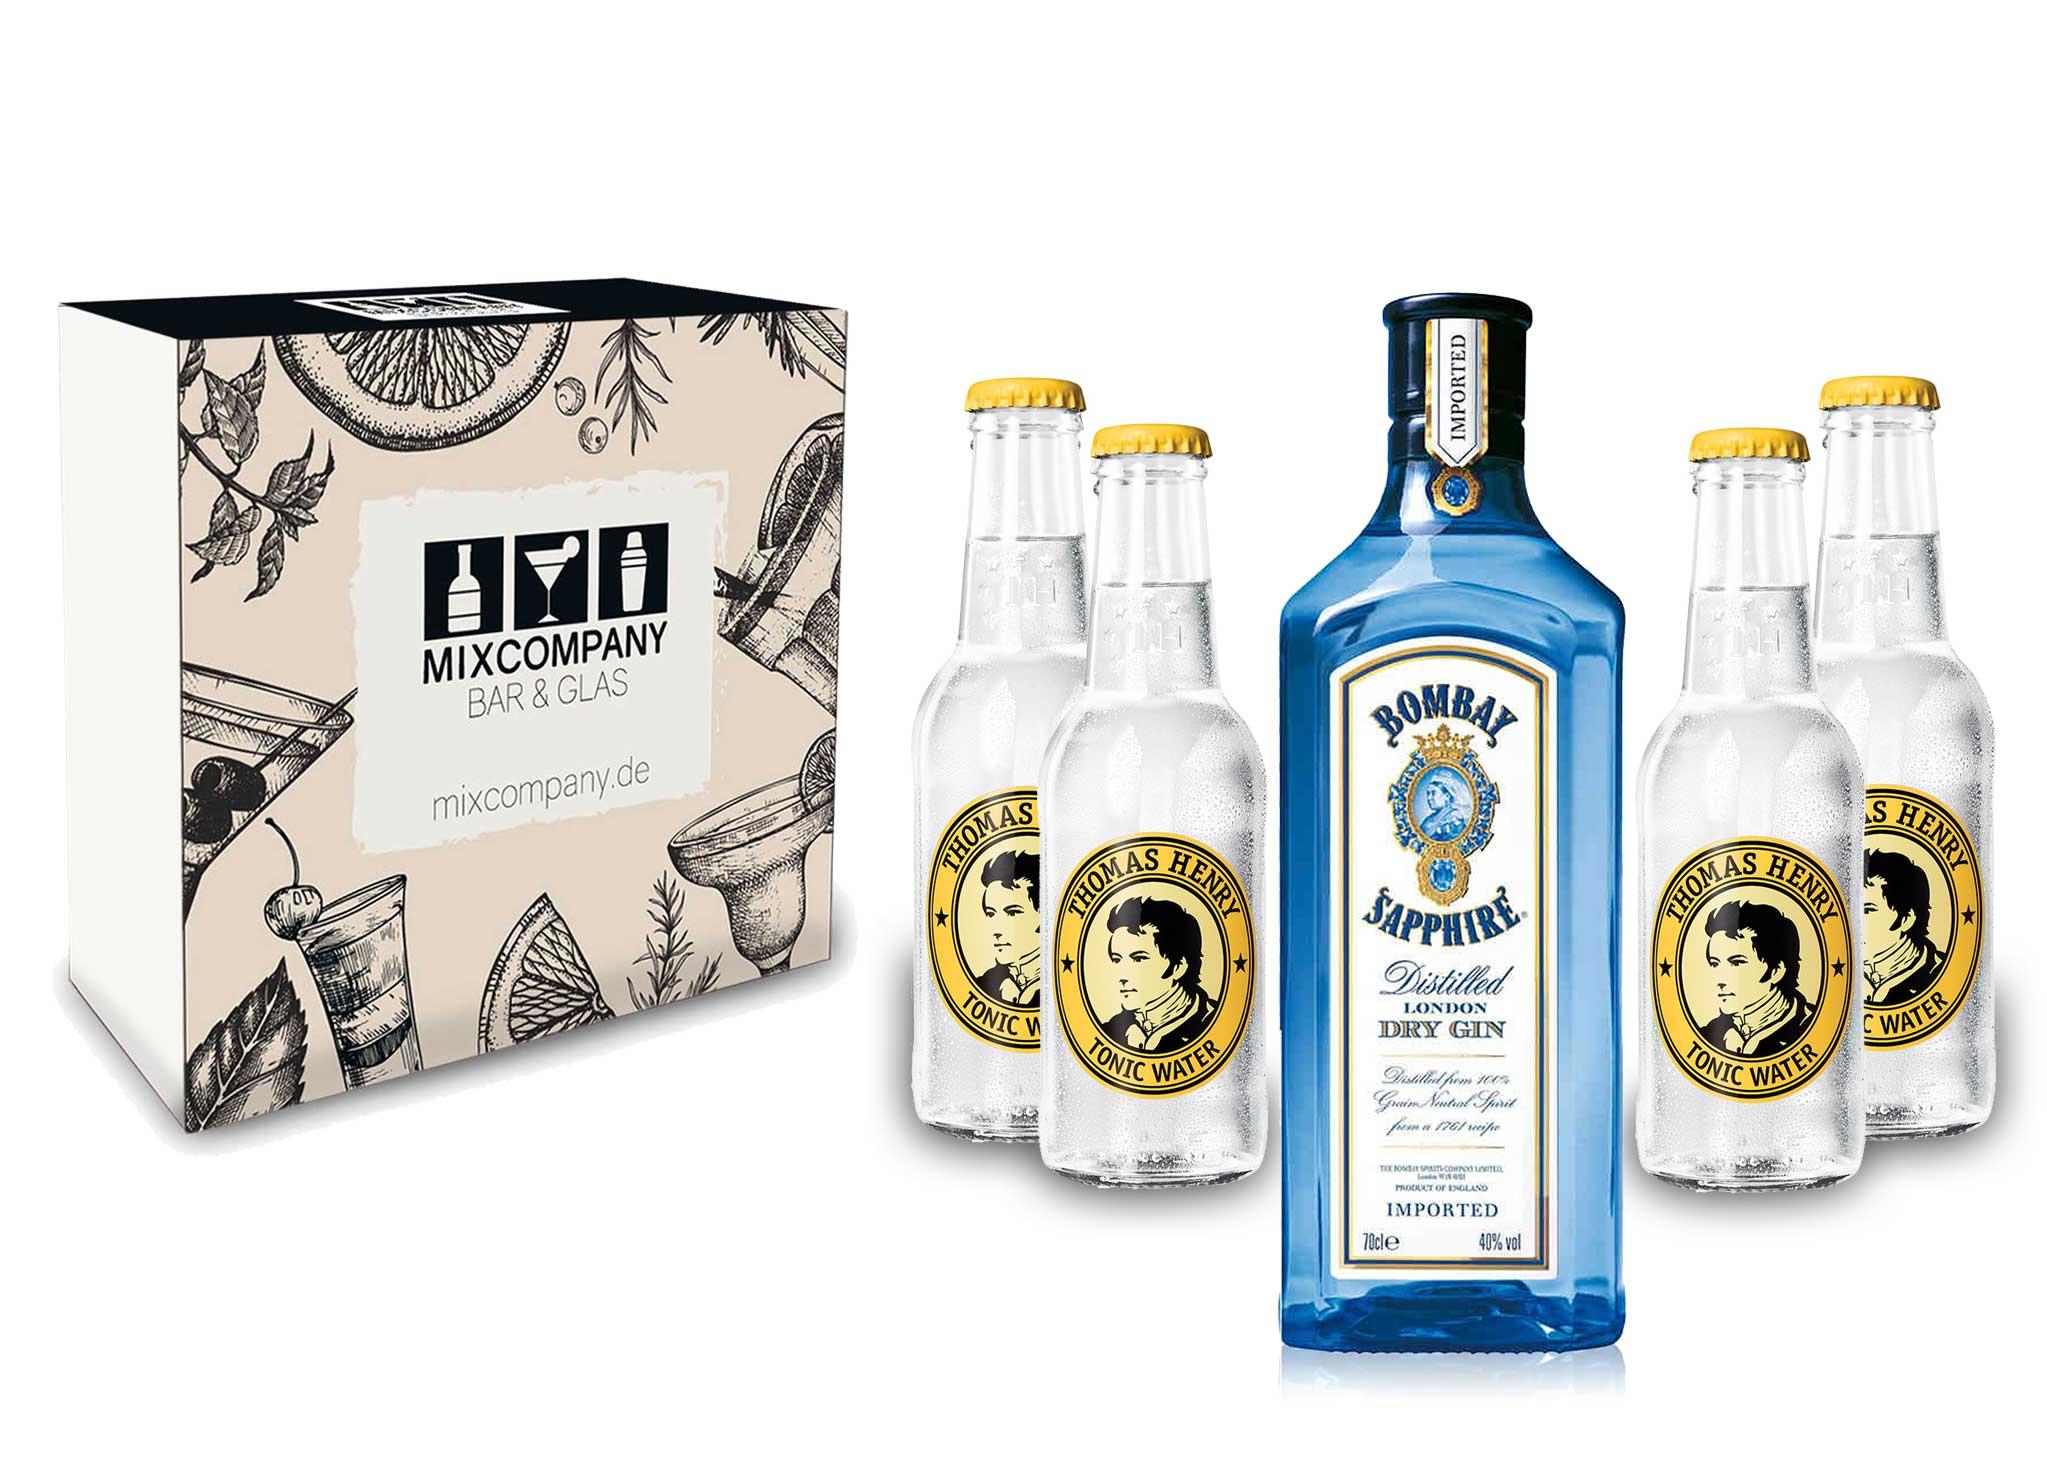 Gin Tonic Giftbox Geschenkset - Bombay Sapphire 0,7l 700ml (40% Vol) + 4x Thomas Henry Tonic Water 200ml inkl. Pfand MEHRWEG + Geschenkverpackung